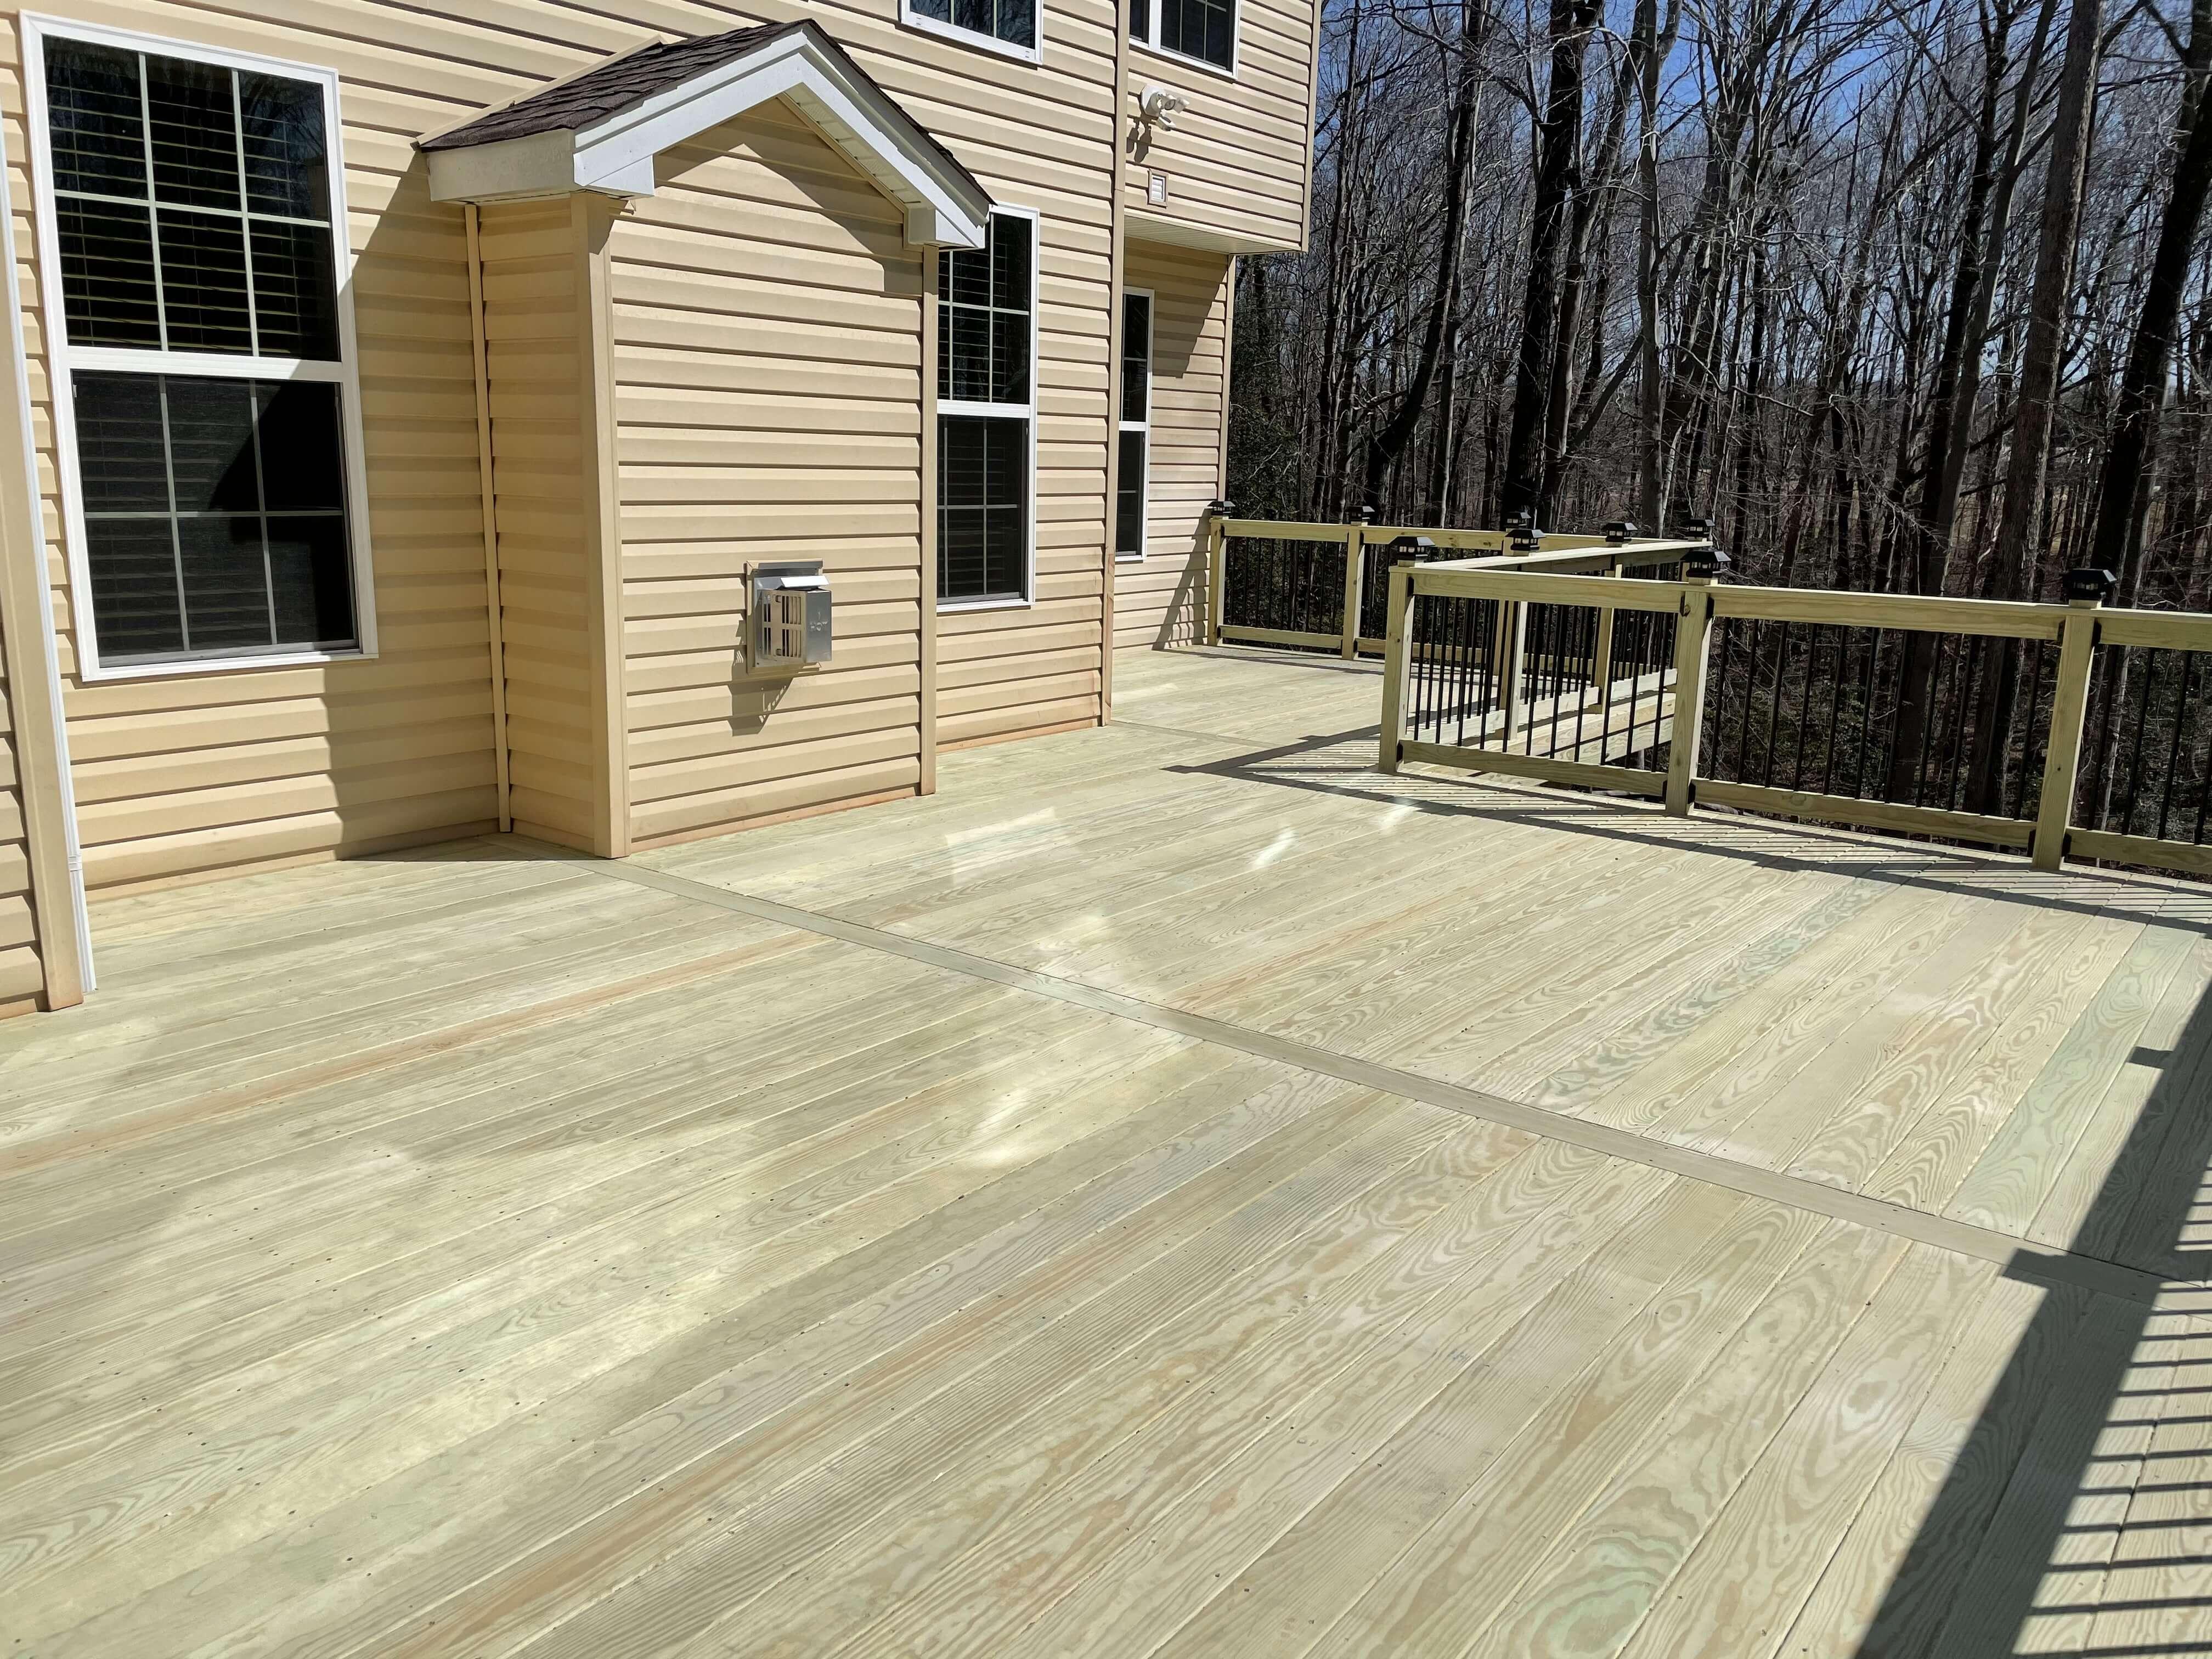 Maryland Deck Remodel 1